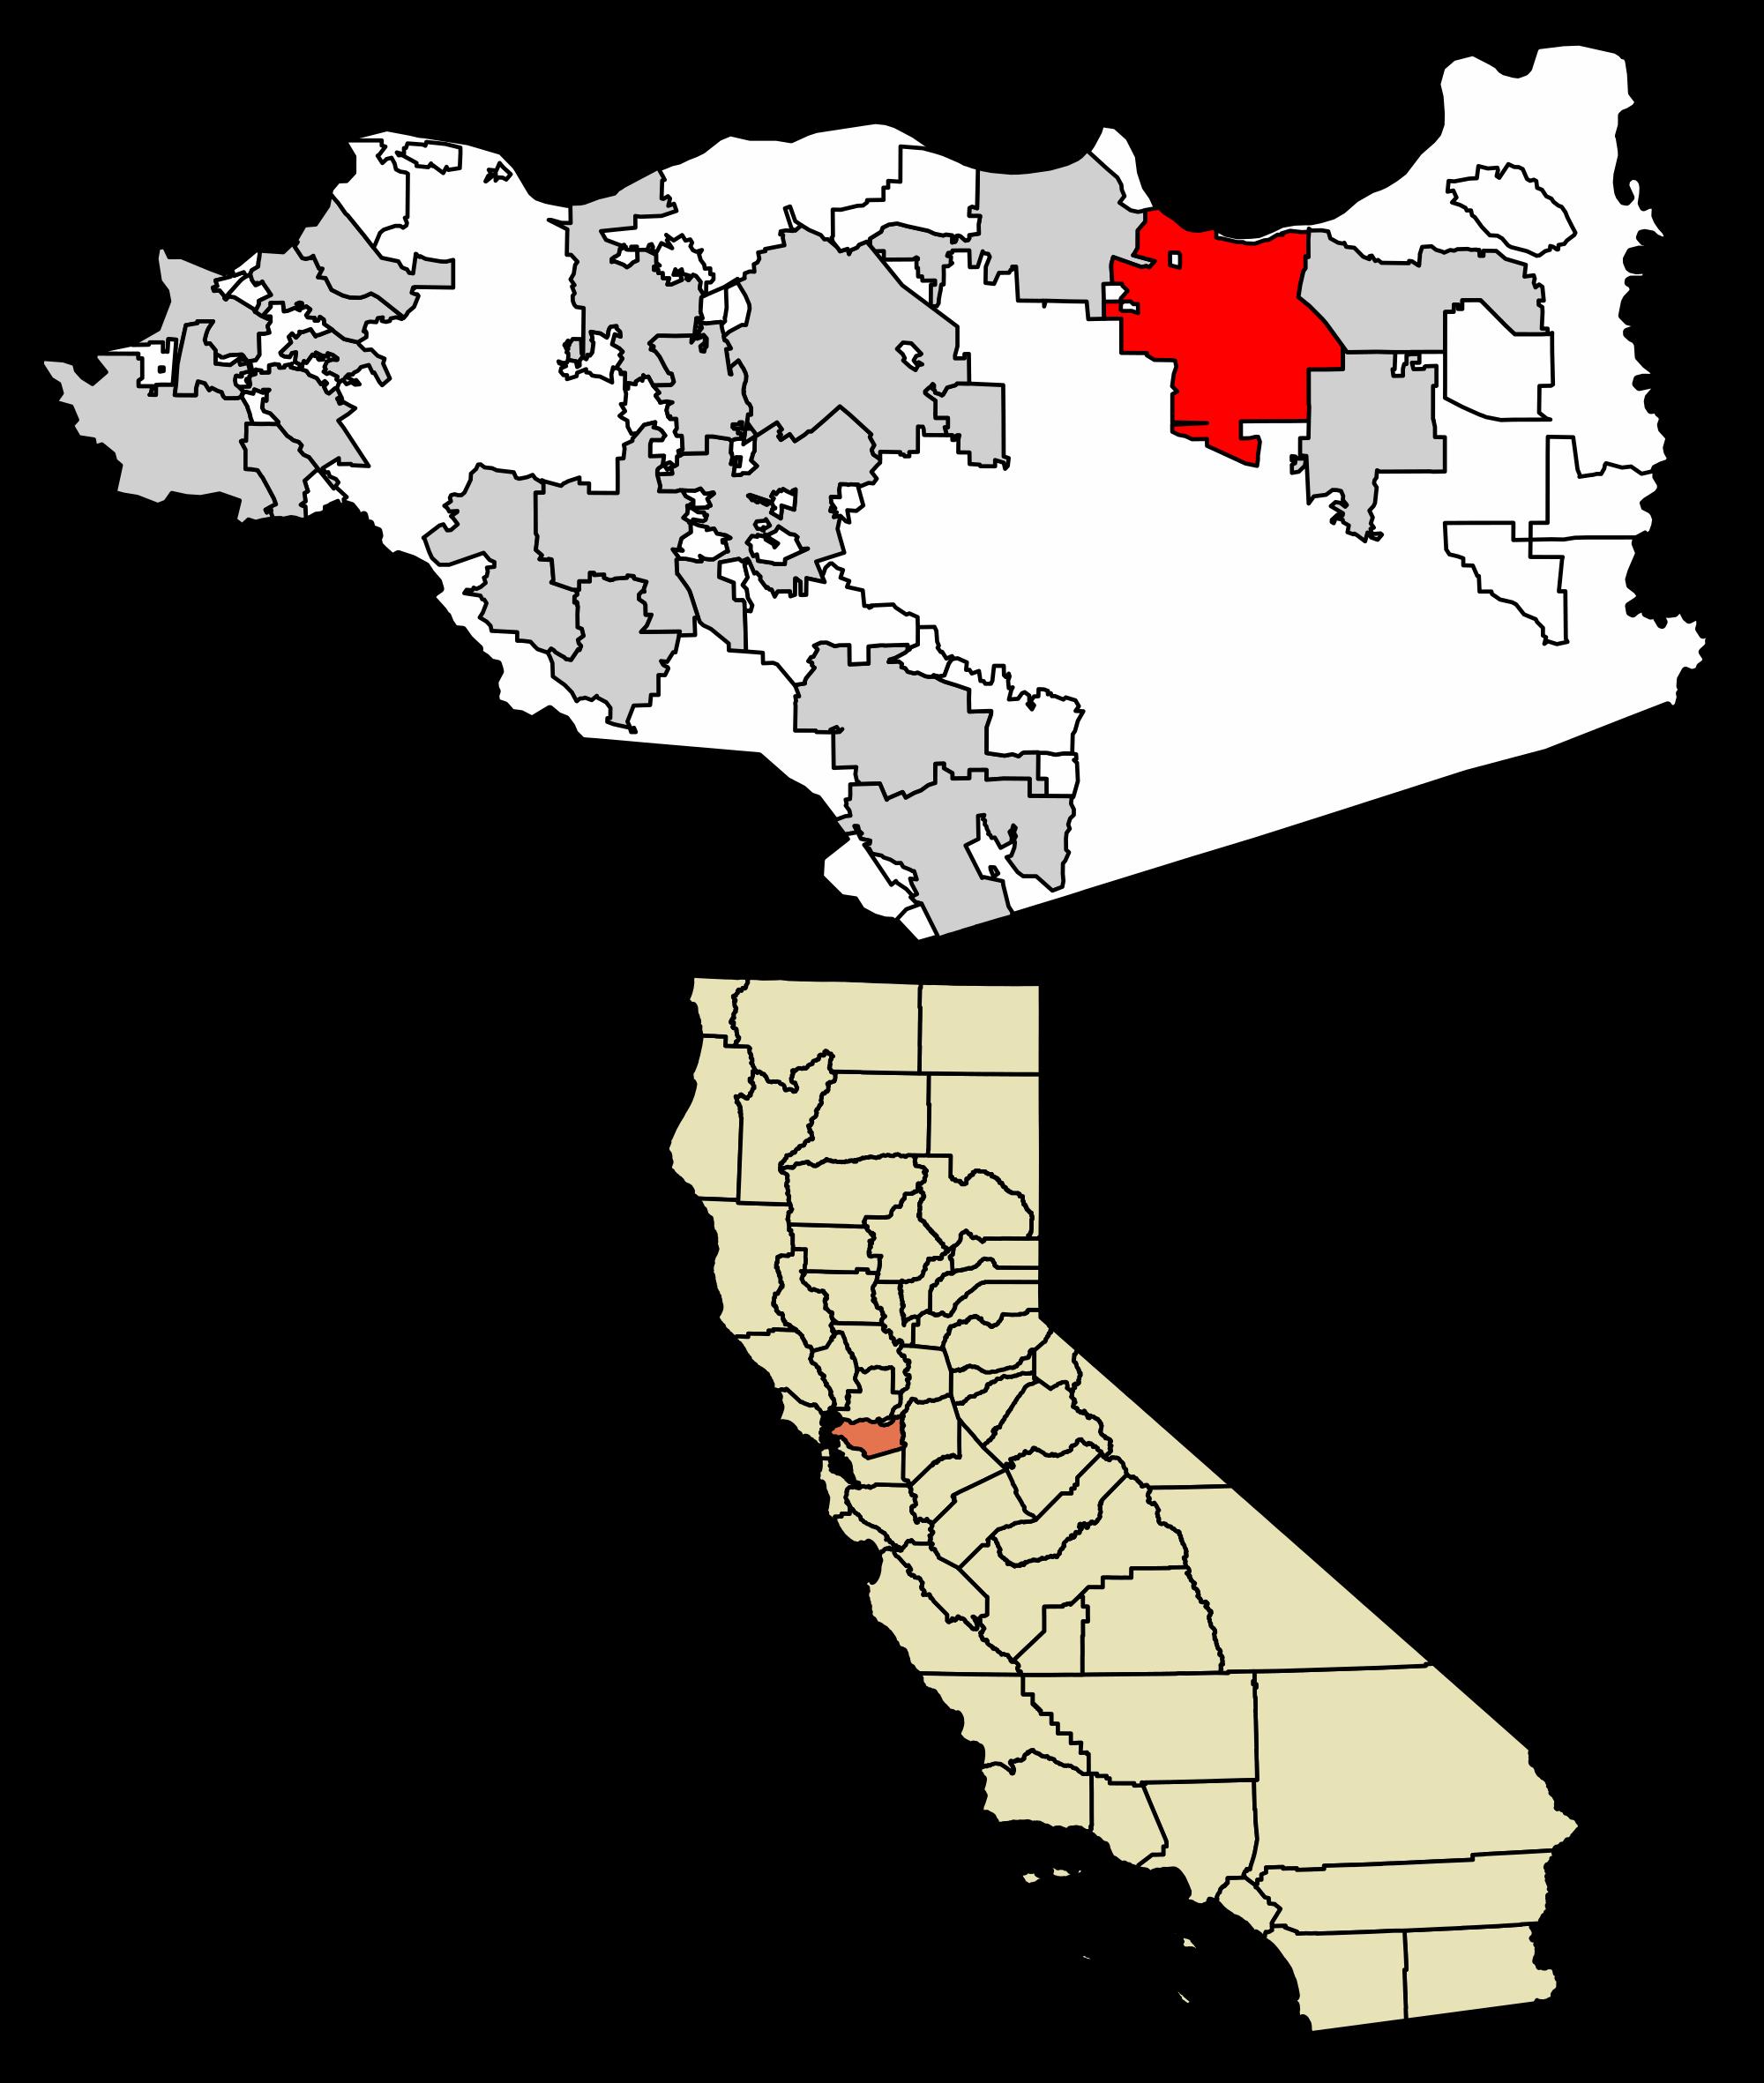 Clipart map delta landform. Antioch california wikipedia location